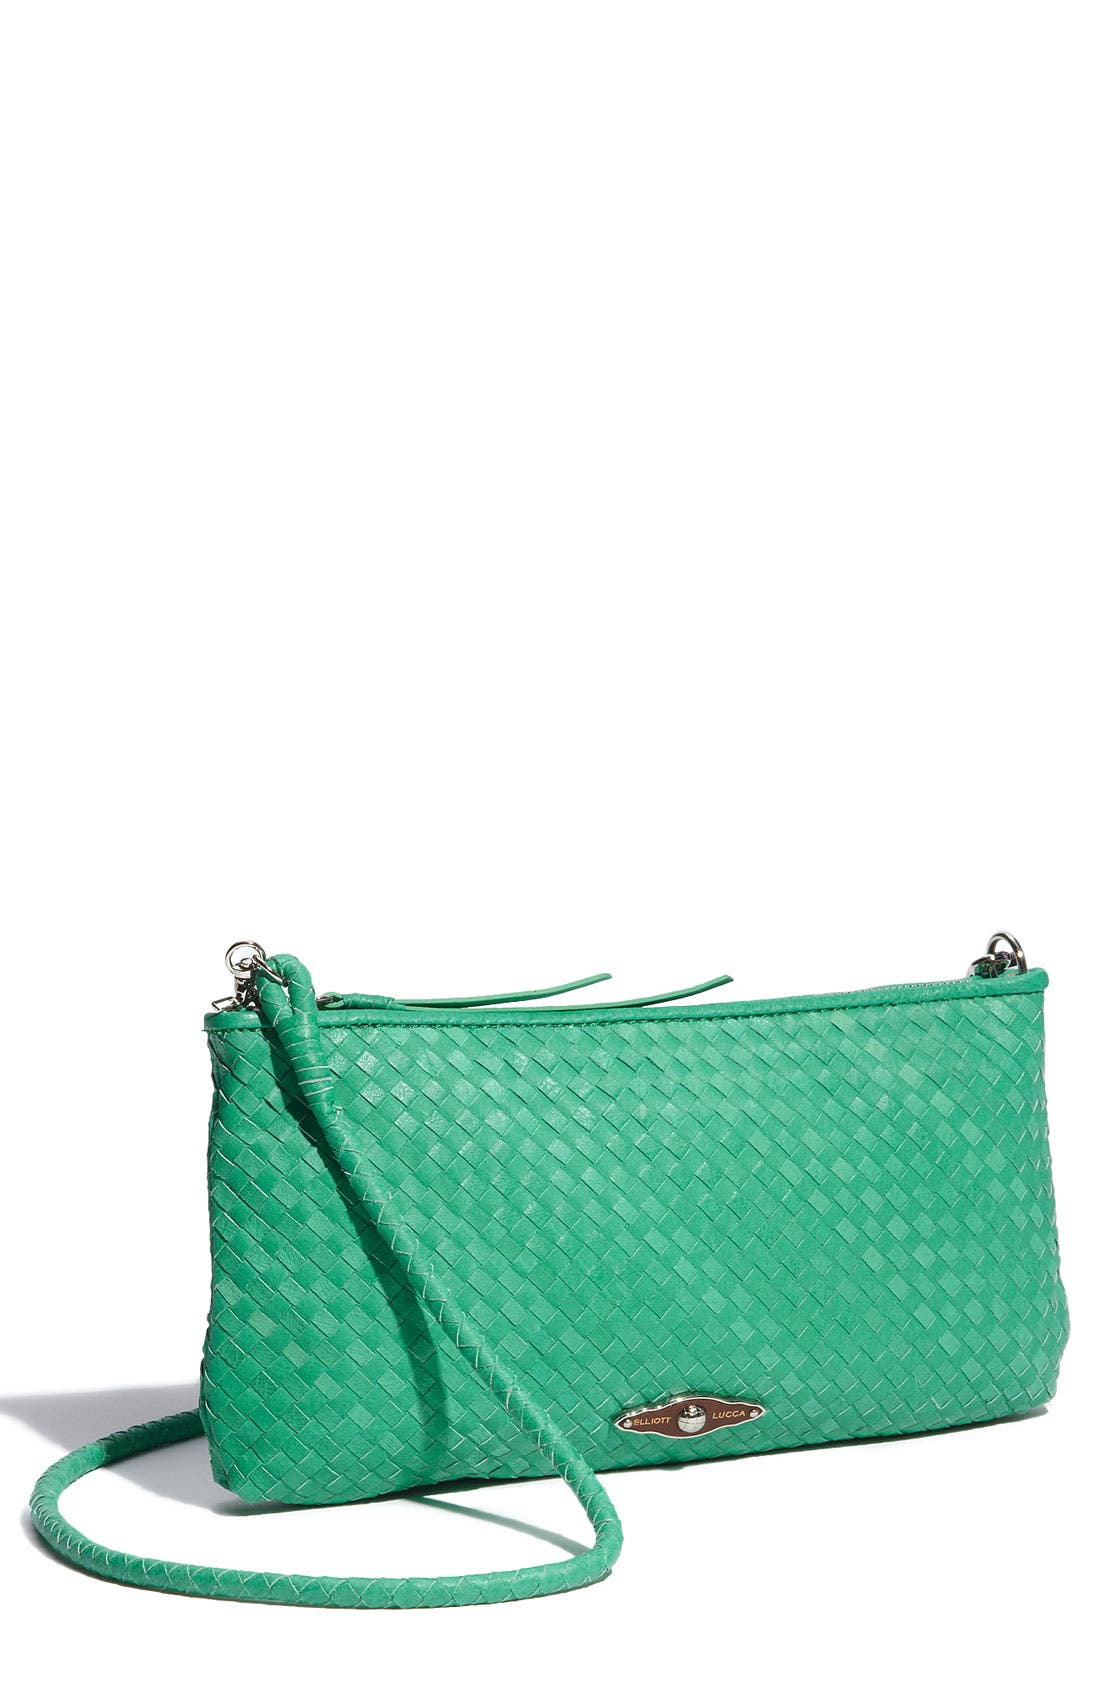 Main Image - Elliott Lucca '3-Way' Woven Leather Demi Bag